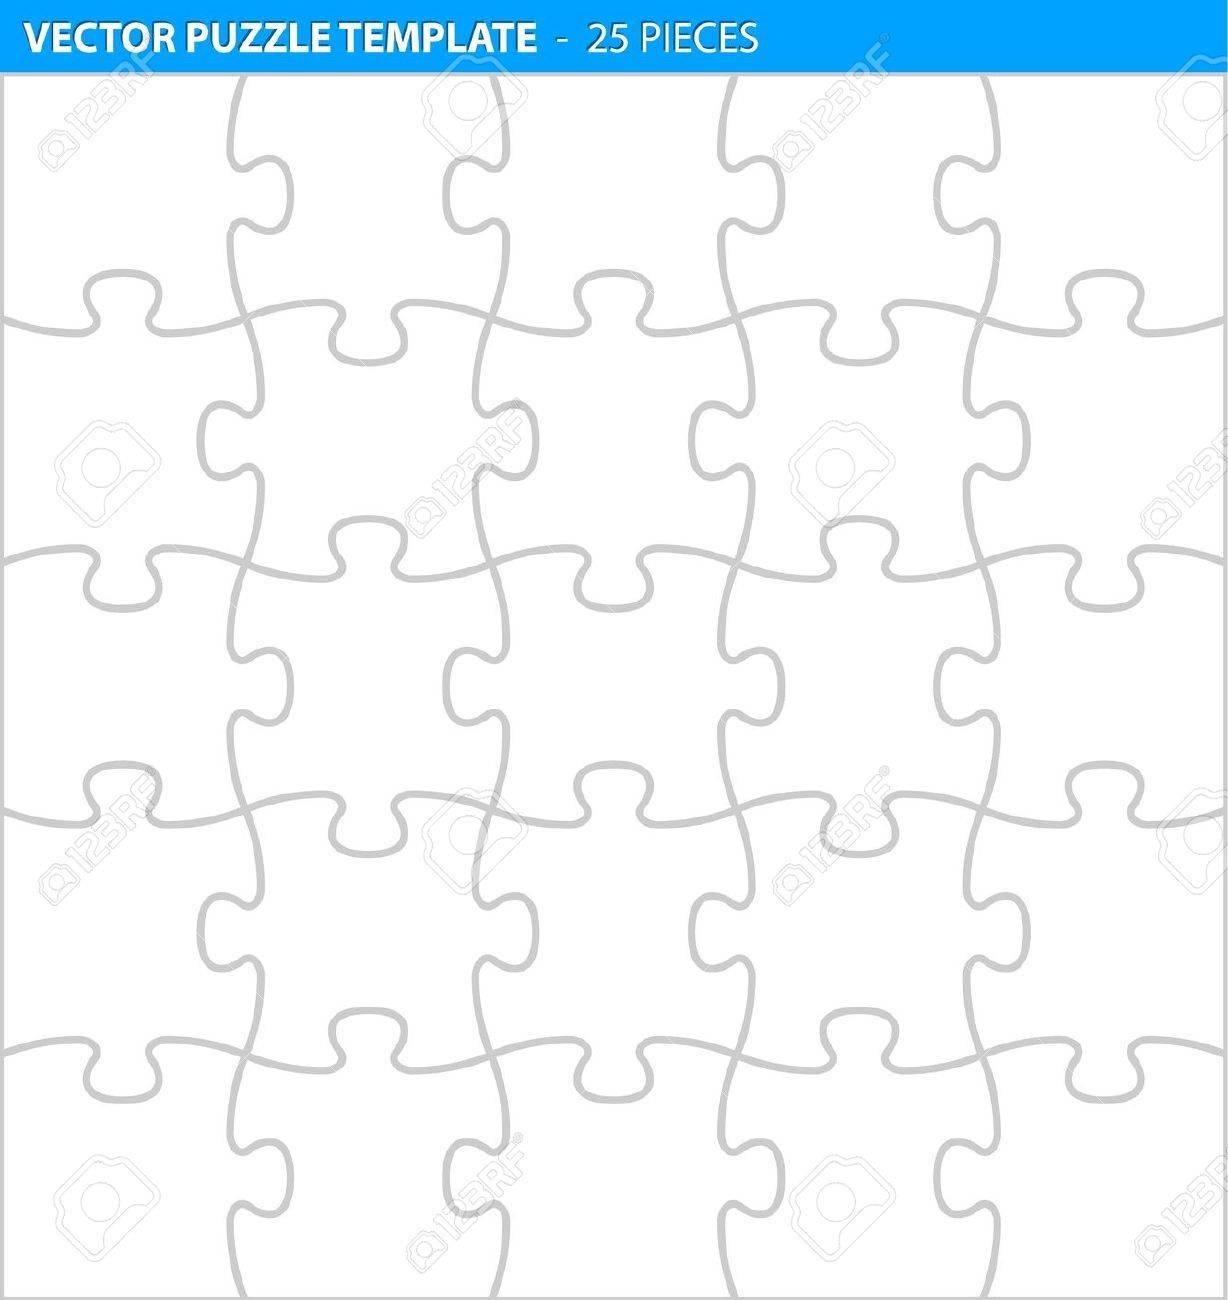 19 Printable Puzzle Piece Templates ᐅ Templatelab 12